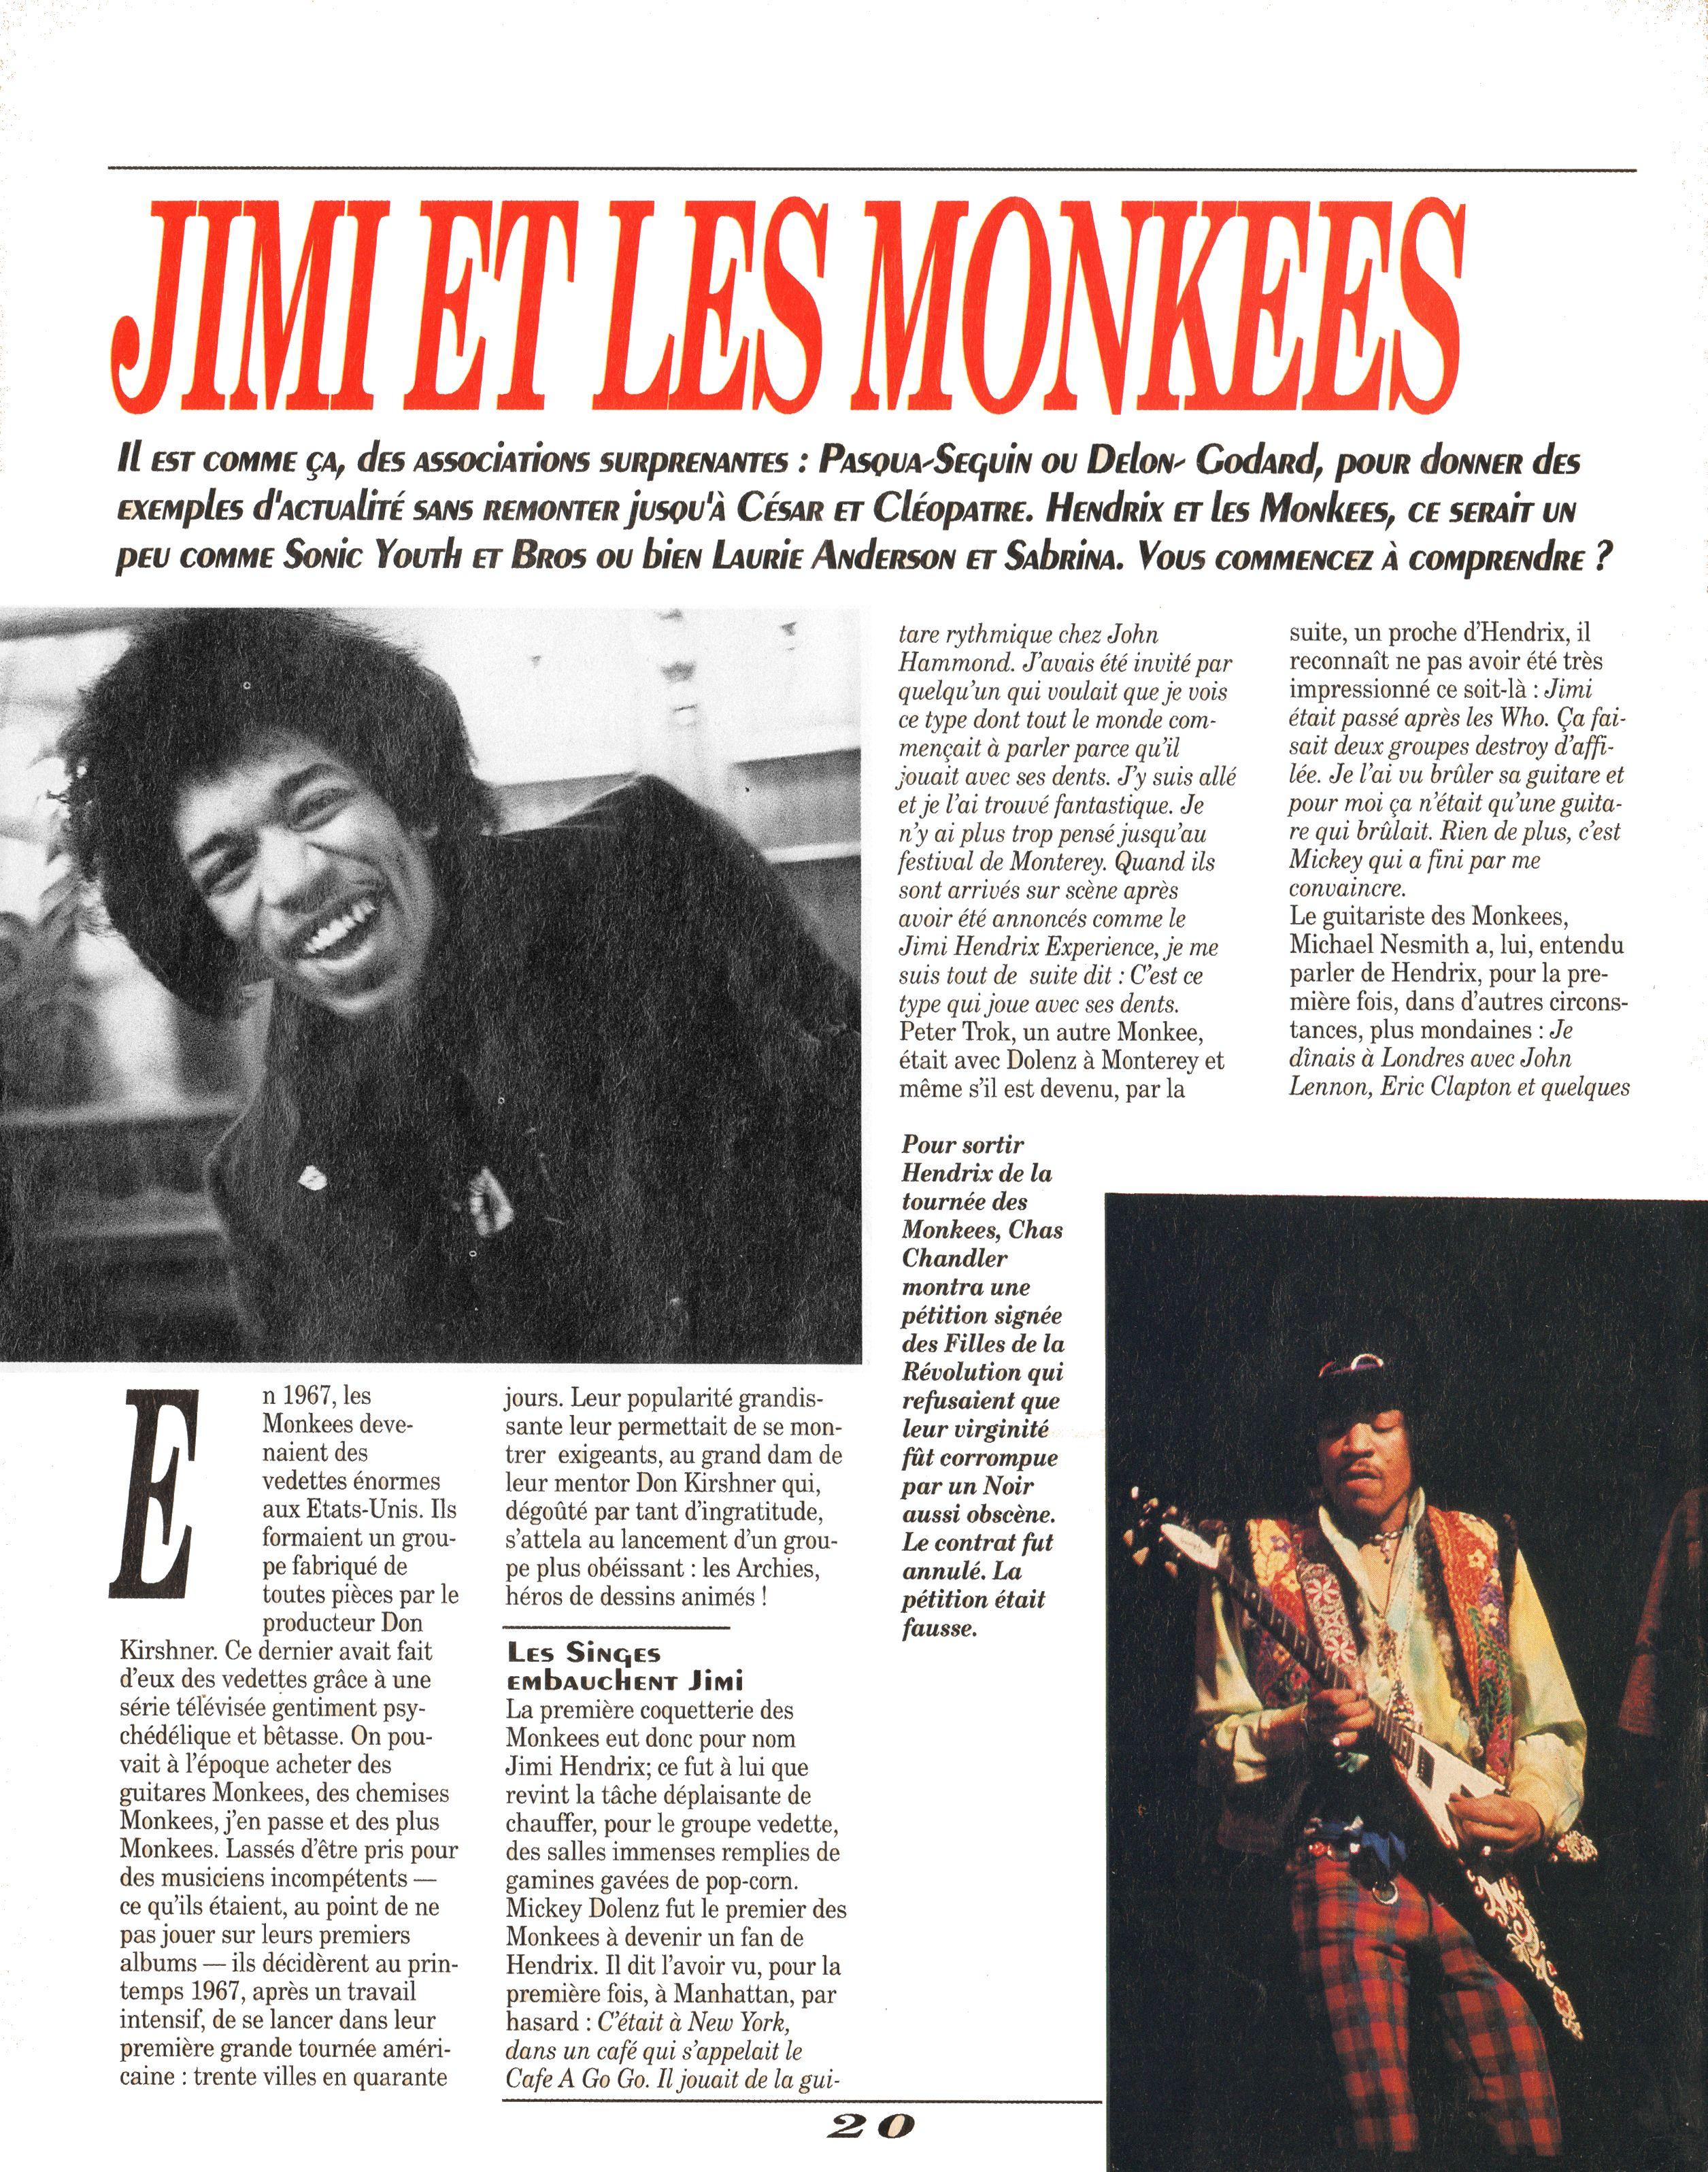 Magazines Français 1989 - 2014 GuitarWorldAvrilMaiJuin1990Page20